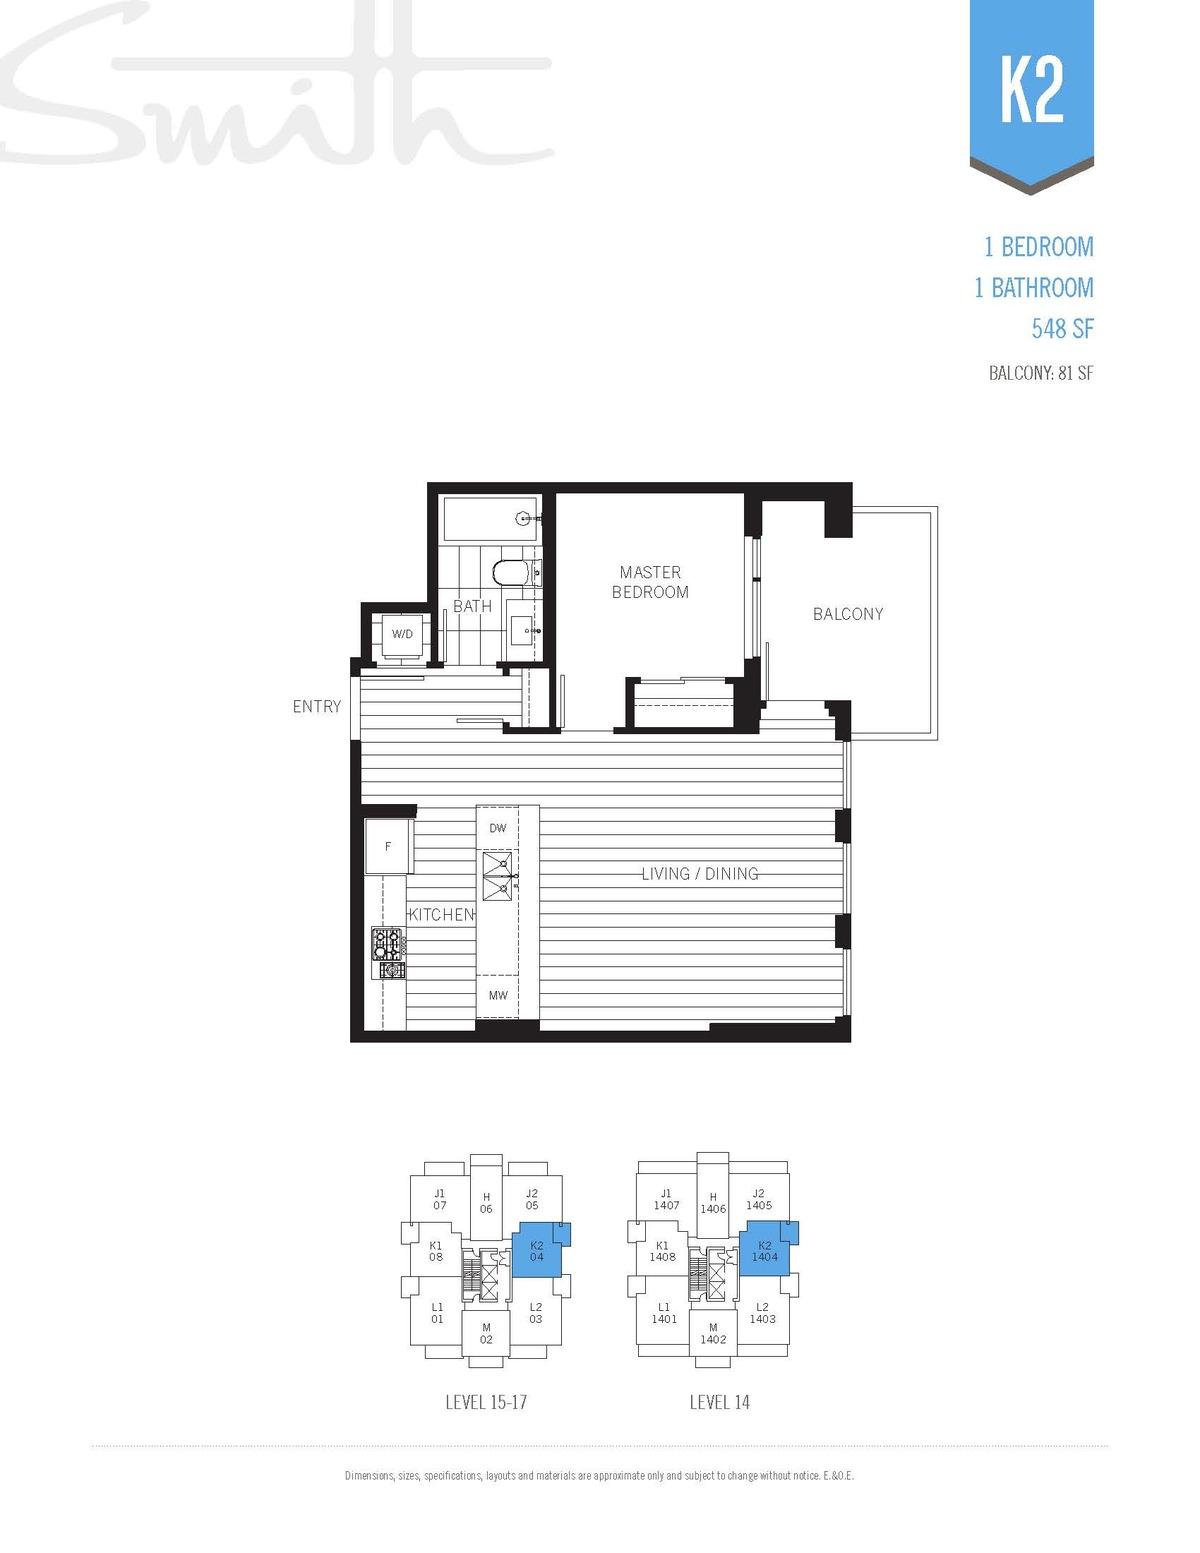 Smith Floorplan K2